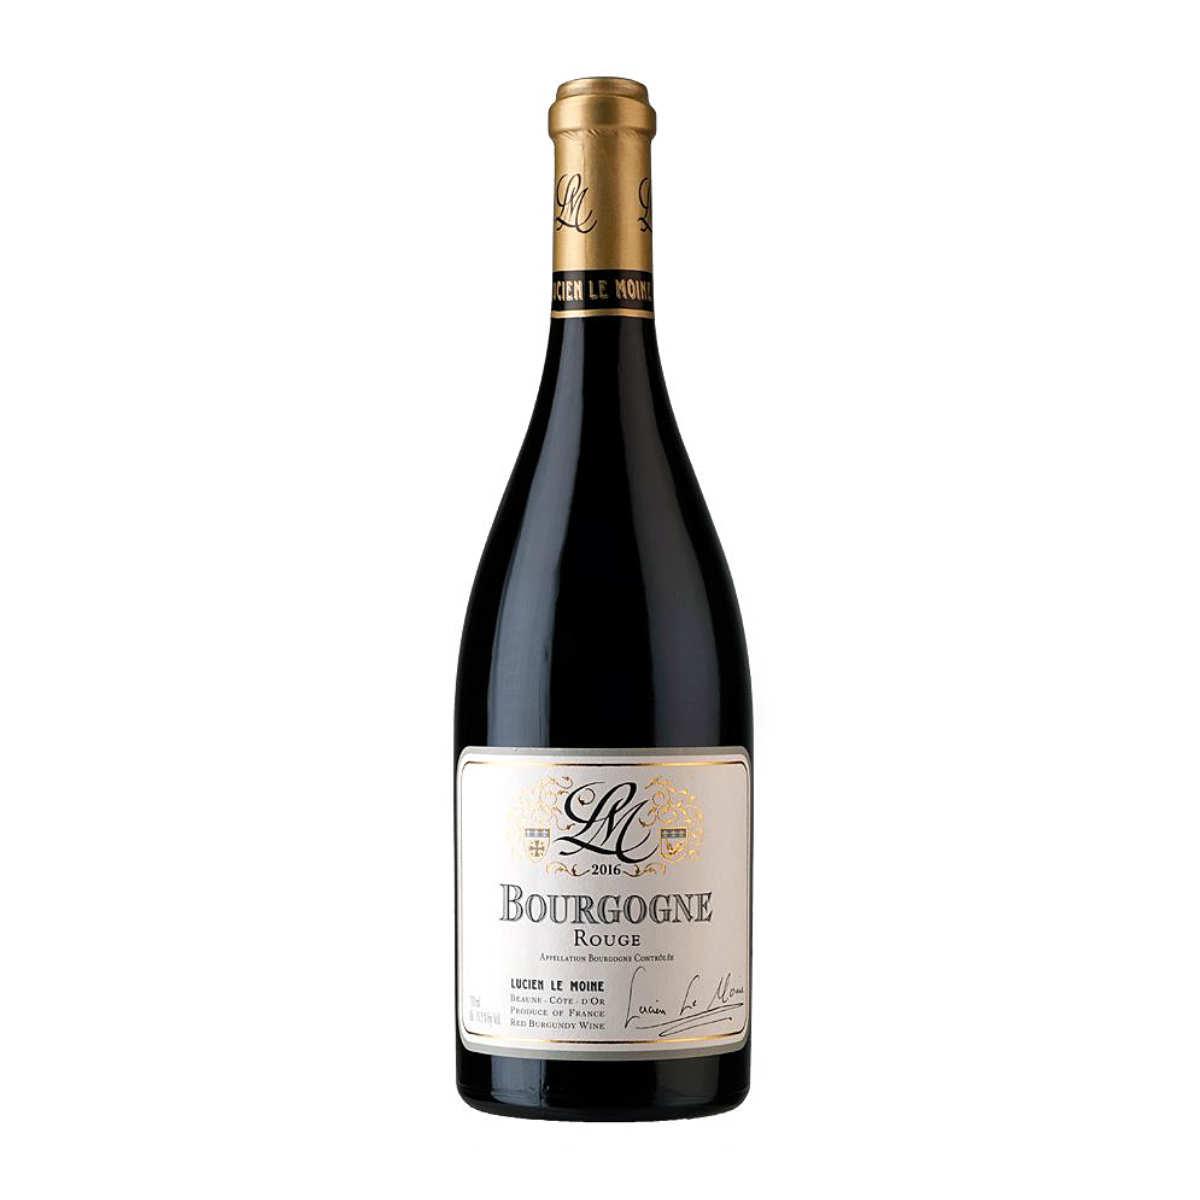 Le Moine Bourgogne Rouge